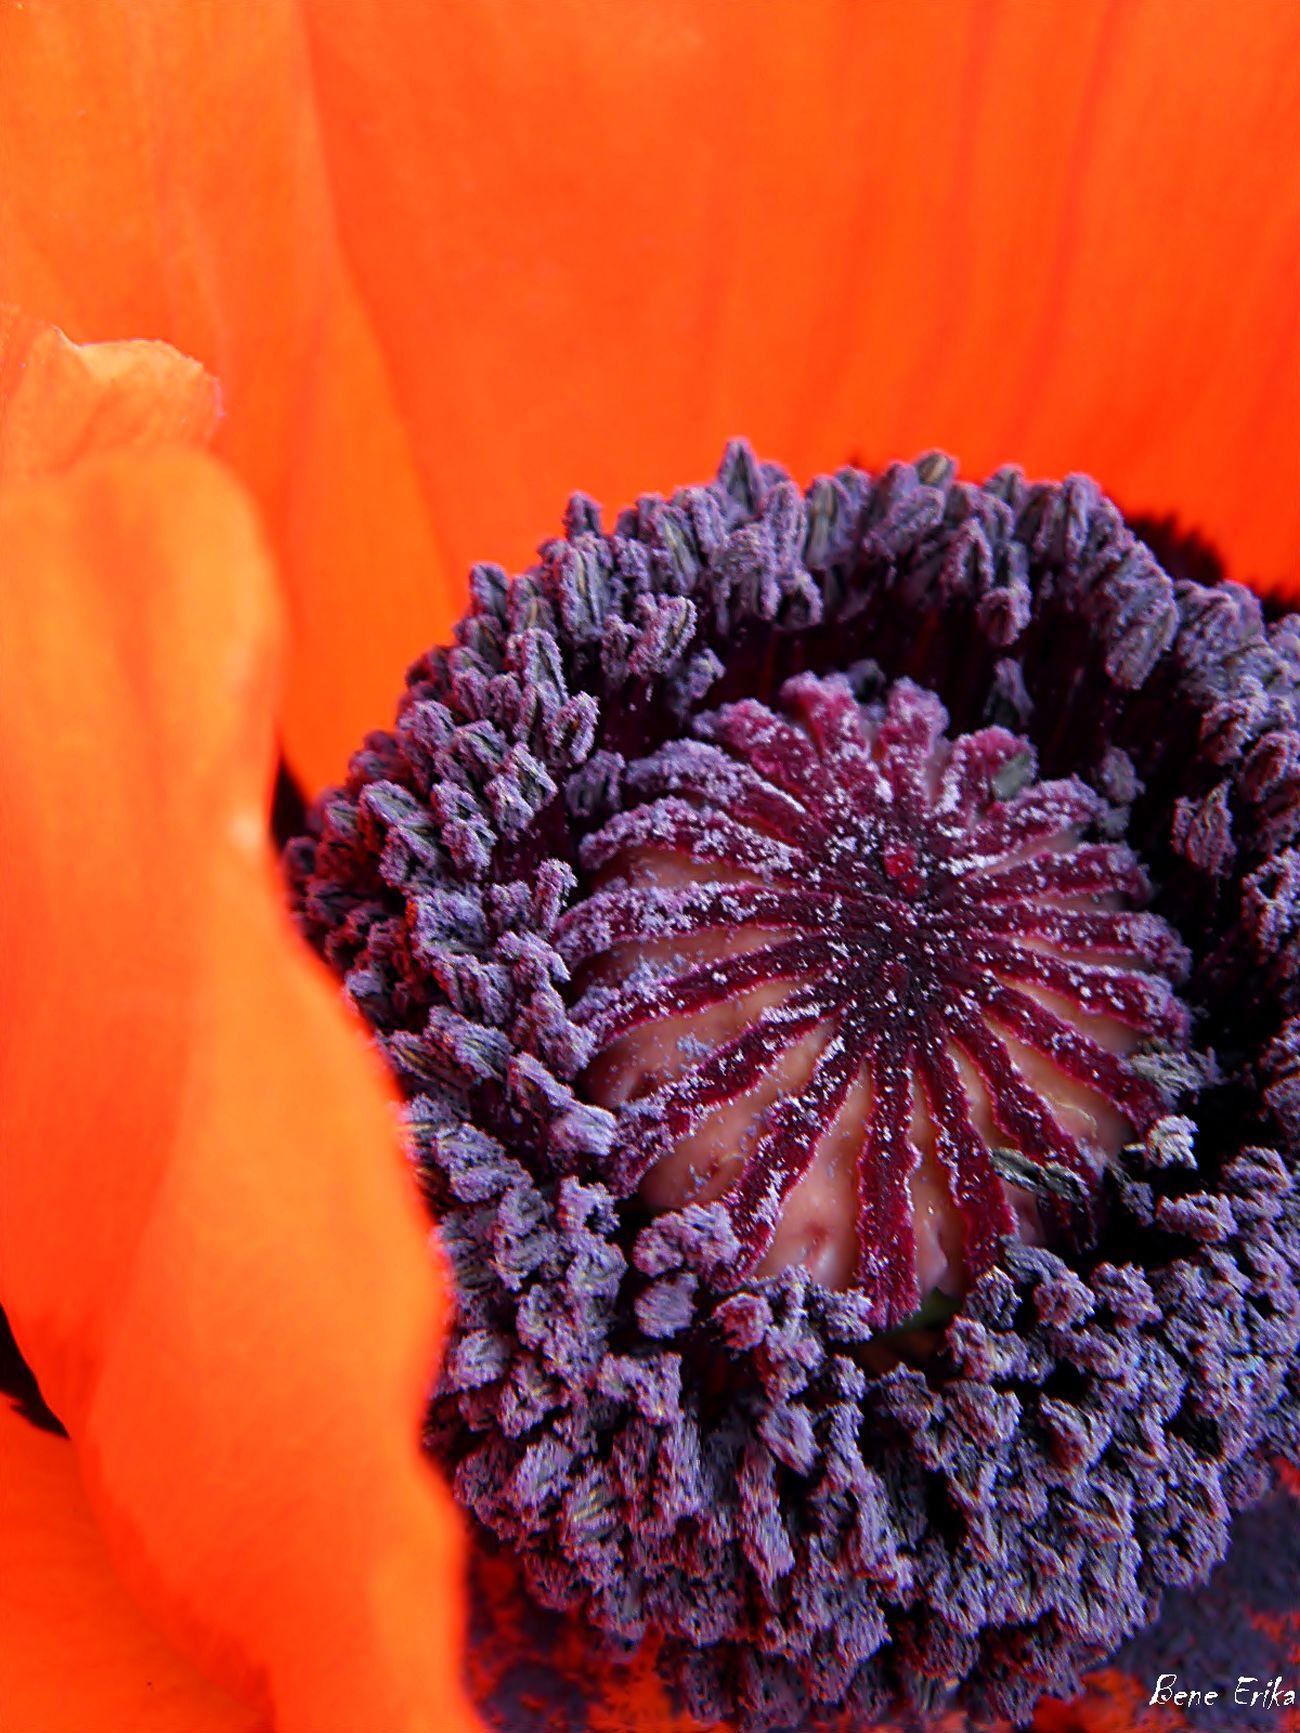 Macro Beauty Karpathian Poppy Poppy Flowers EyeEm Gallery Eyemflowerlover Eyemphotography Red